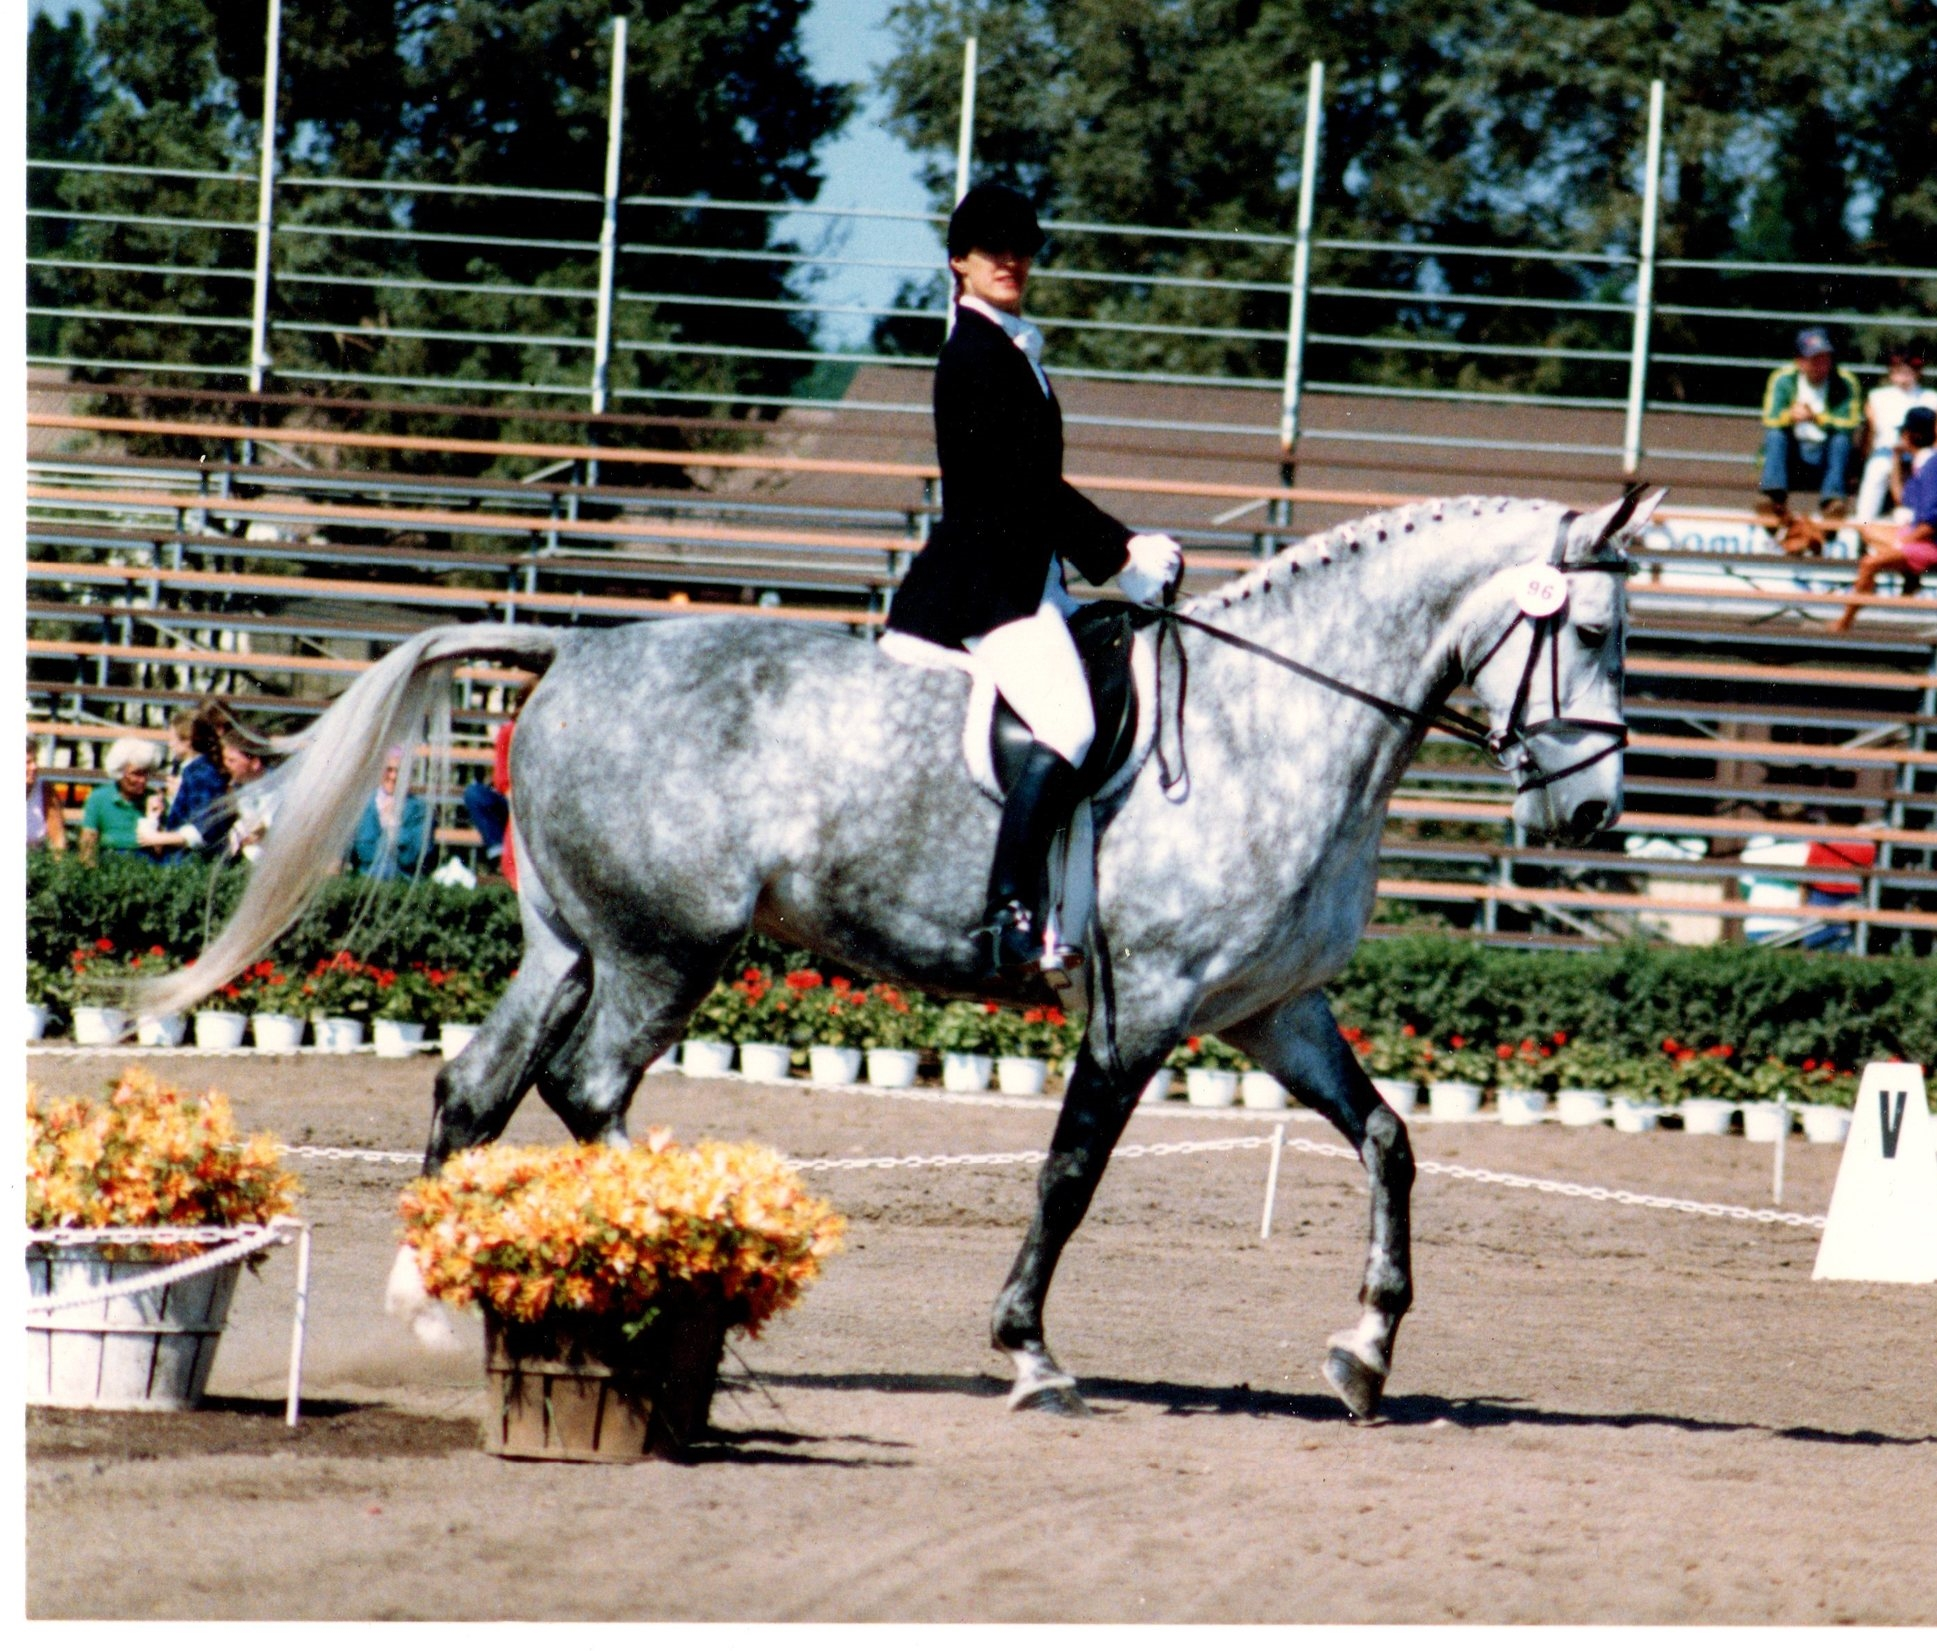 dressage show in VA with my horse Vera